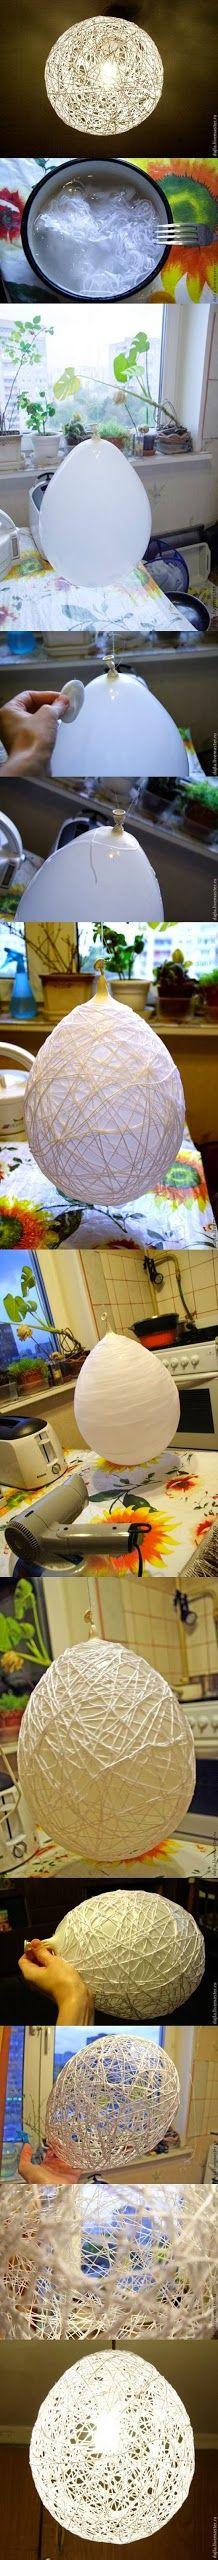 DIY : Yarn Made Chandelier | DIY & Crafts Tutorials